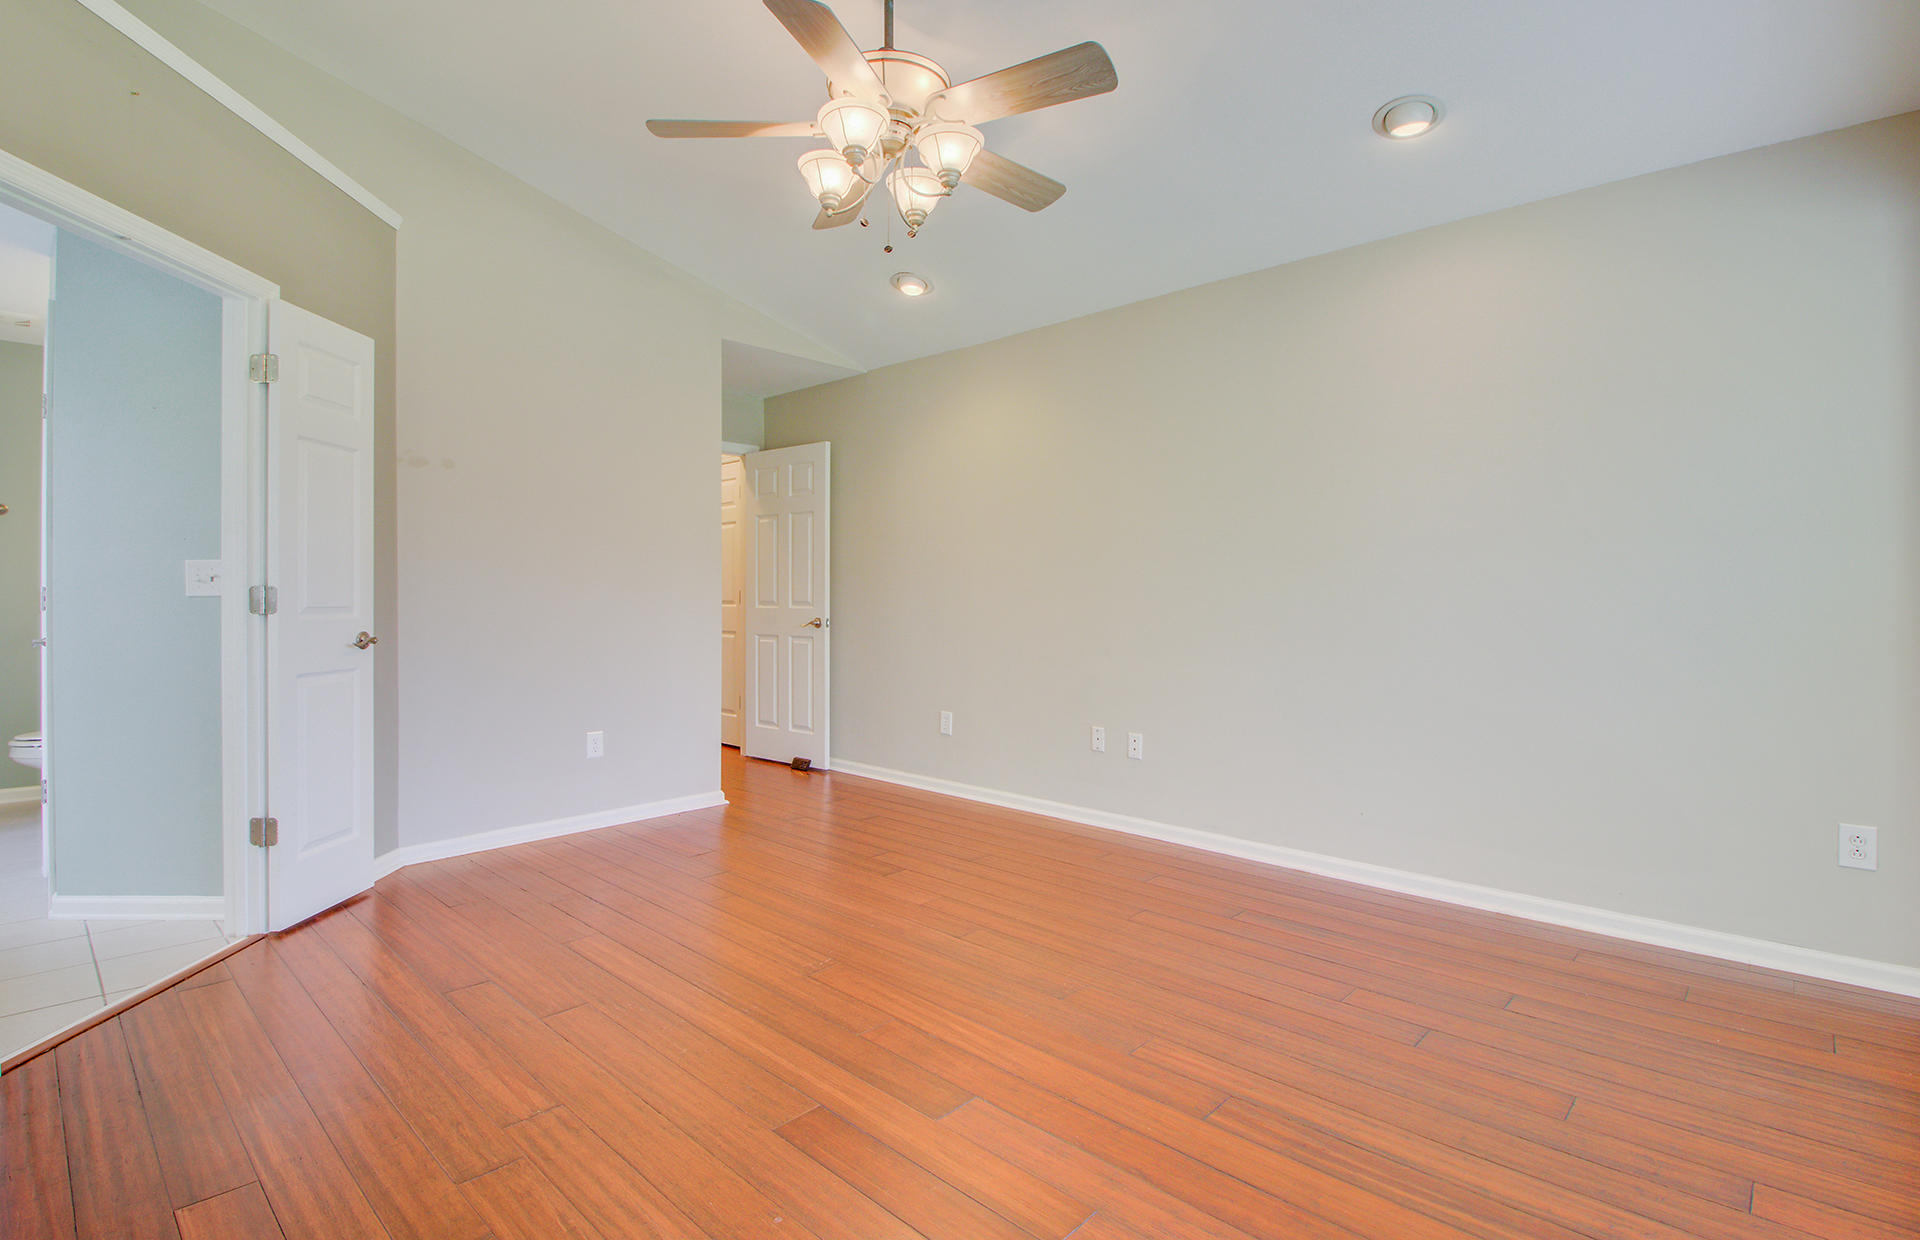 Grand Oaks Plantation Homes For Sale - 789 Bent Hickory, Charleston, SC - 17